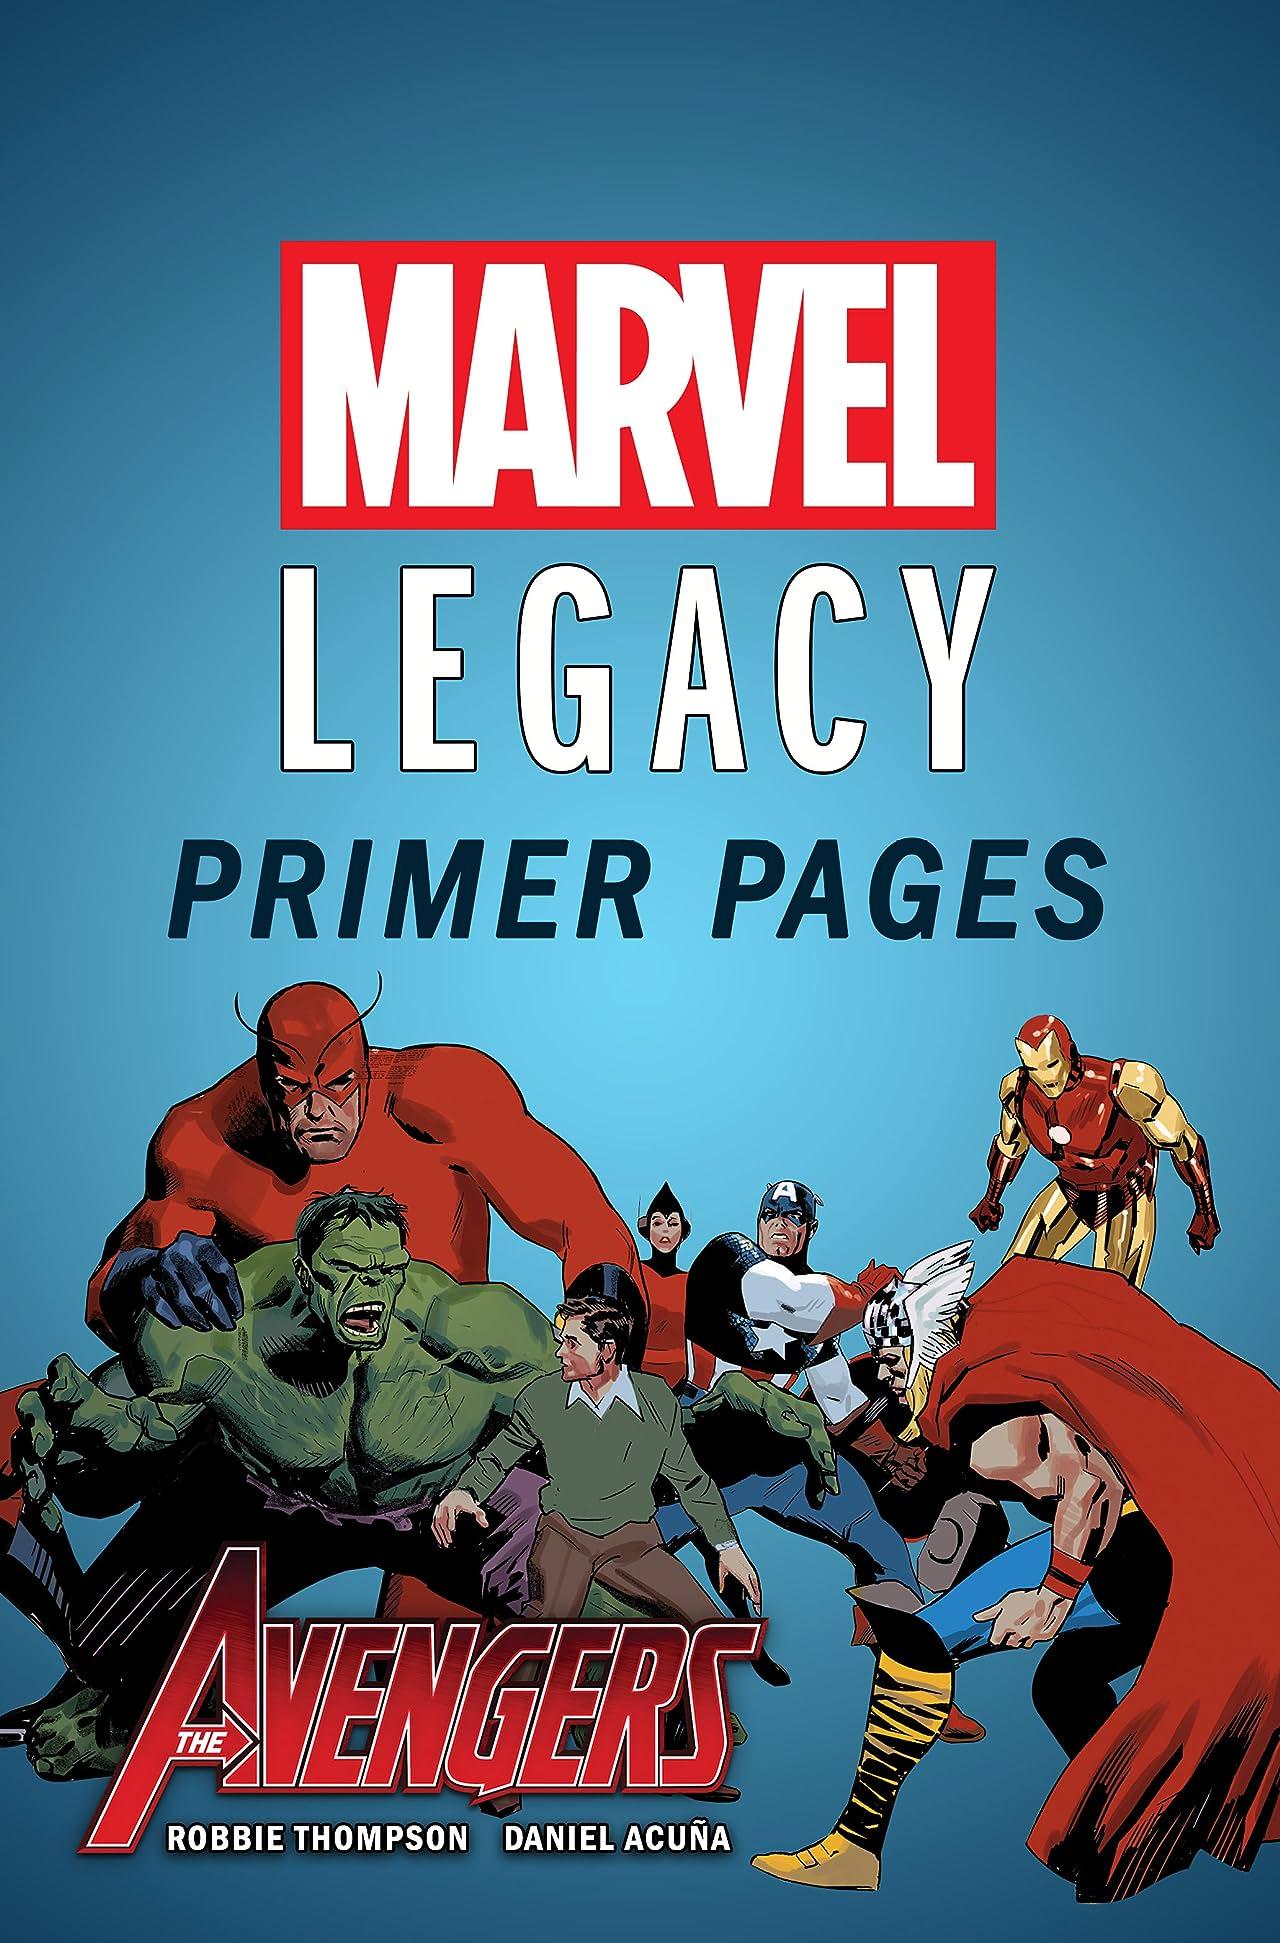 Avengers - Marvel Legacy Primer Pages